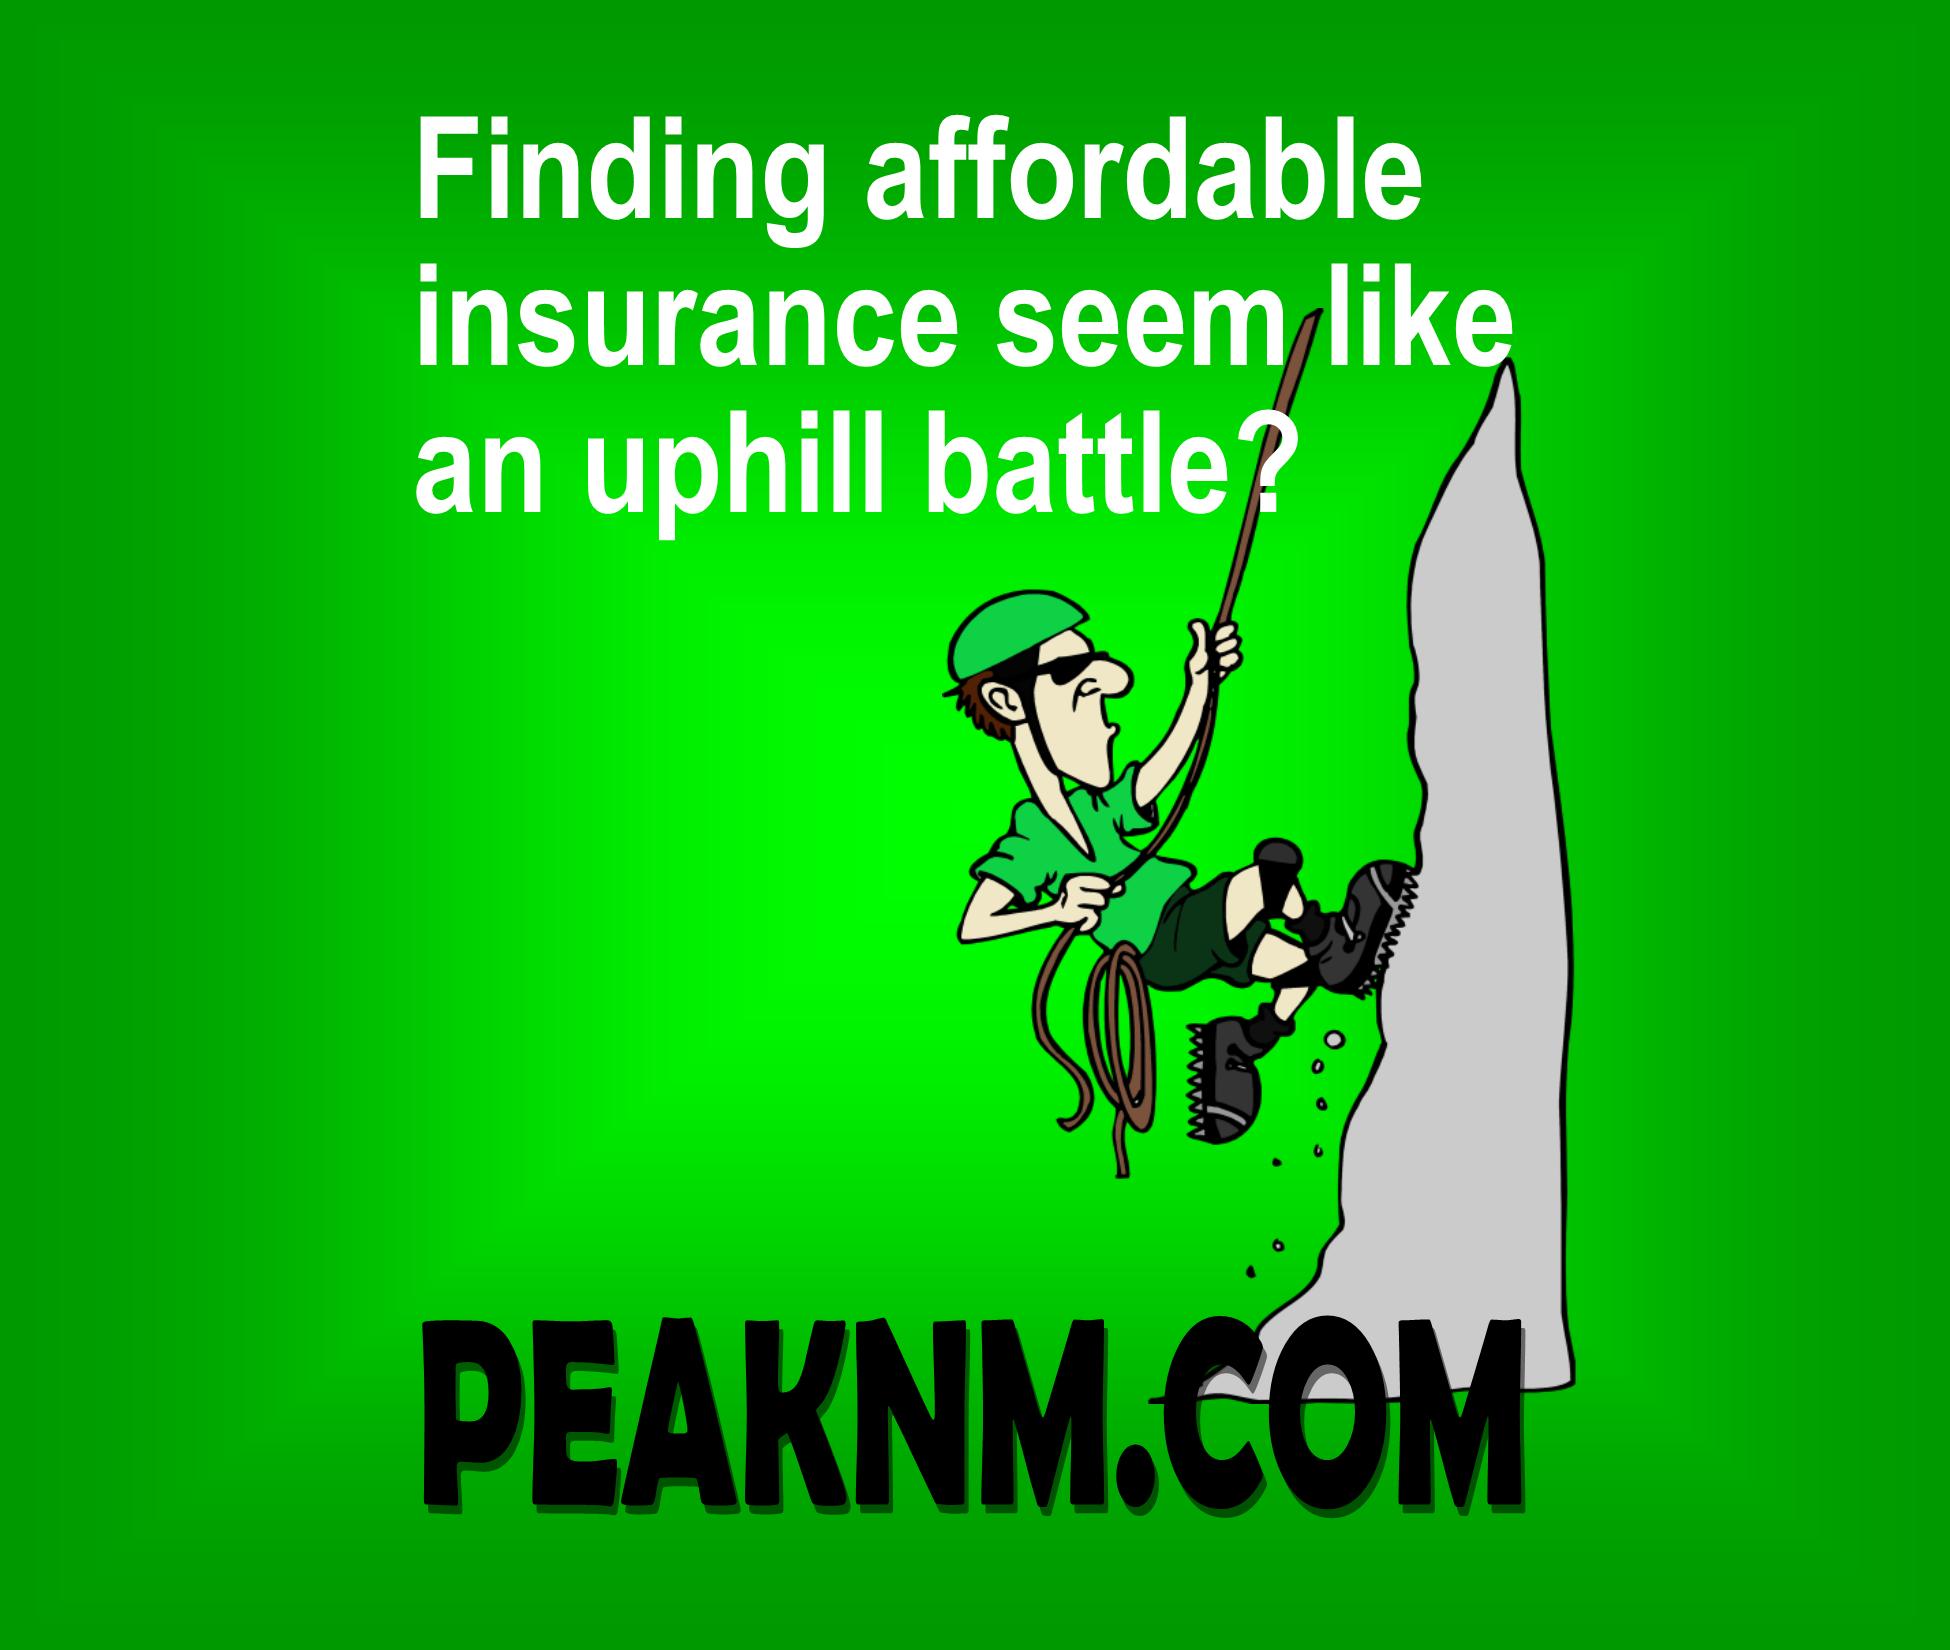 Pin by PEAK INSURANCE on Peak Insurance   Being a landlord ...